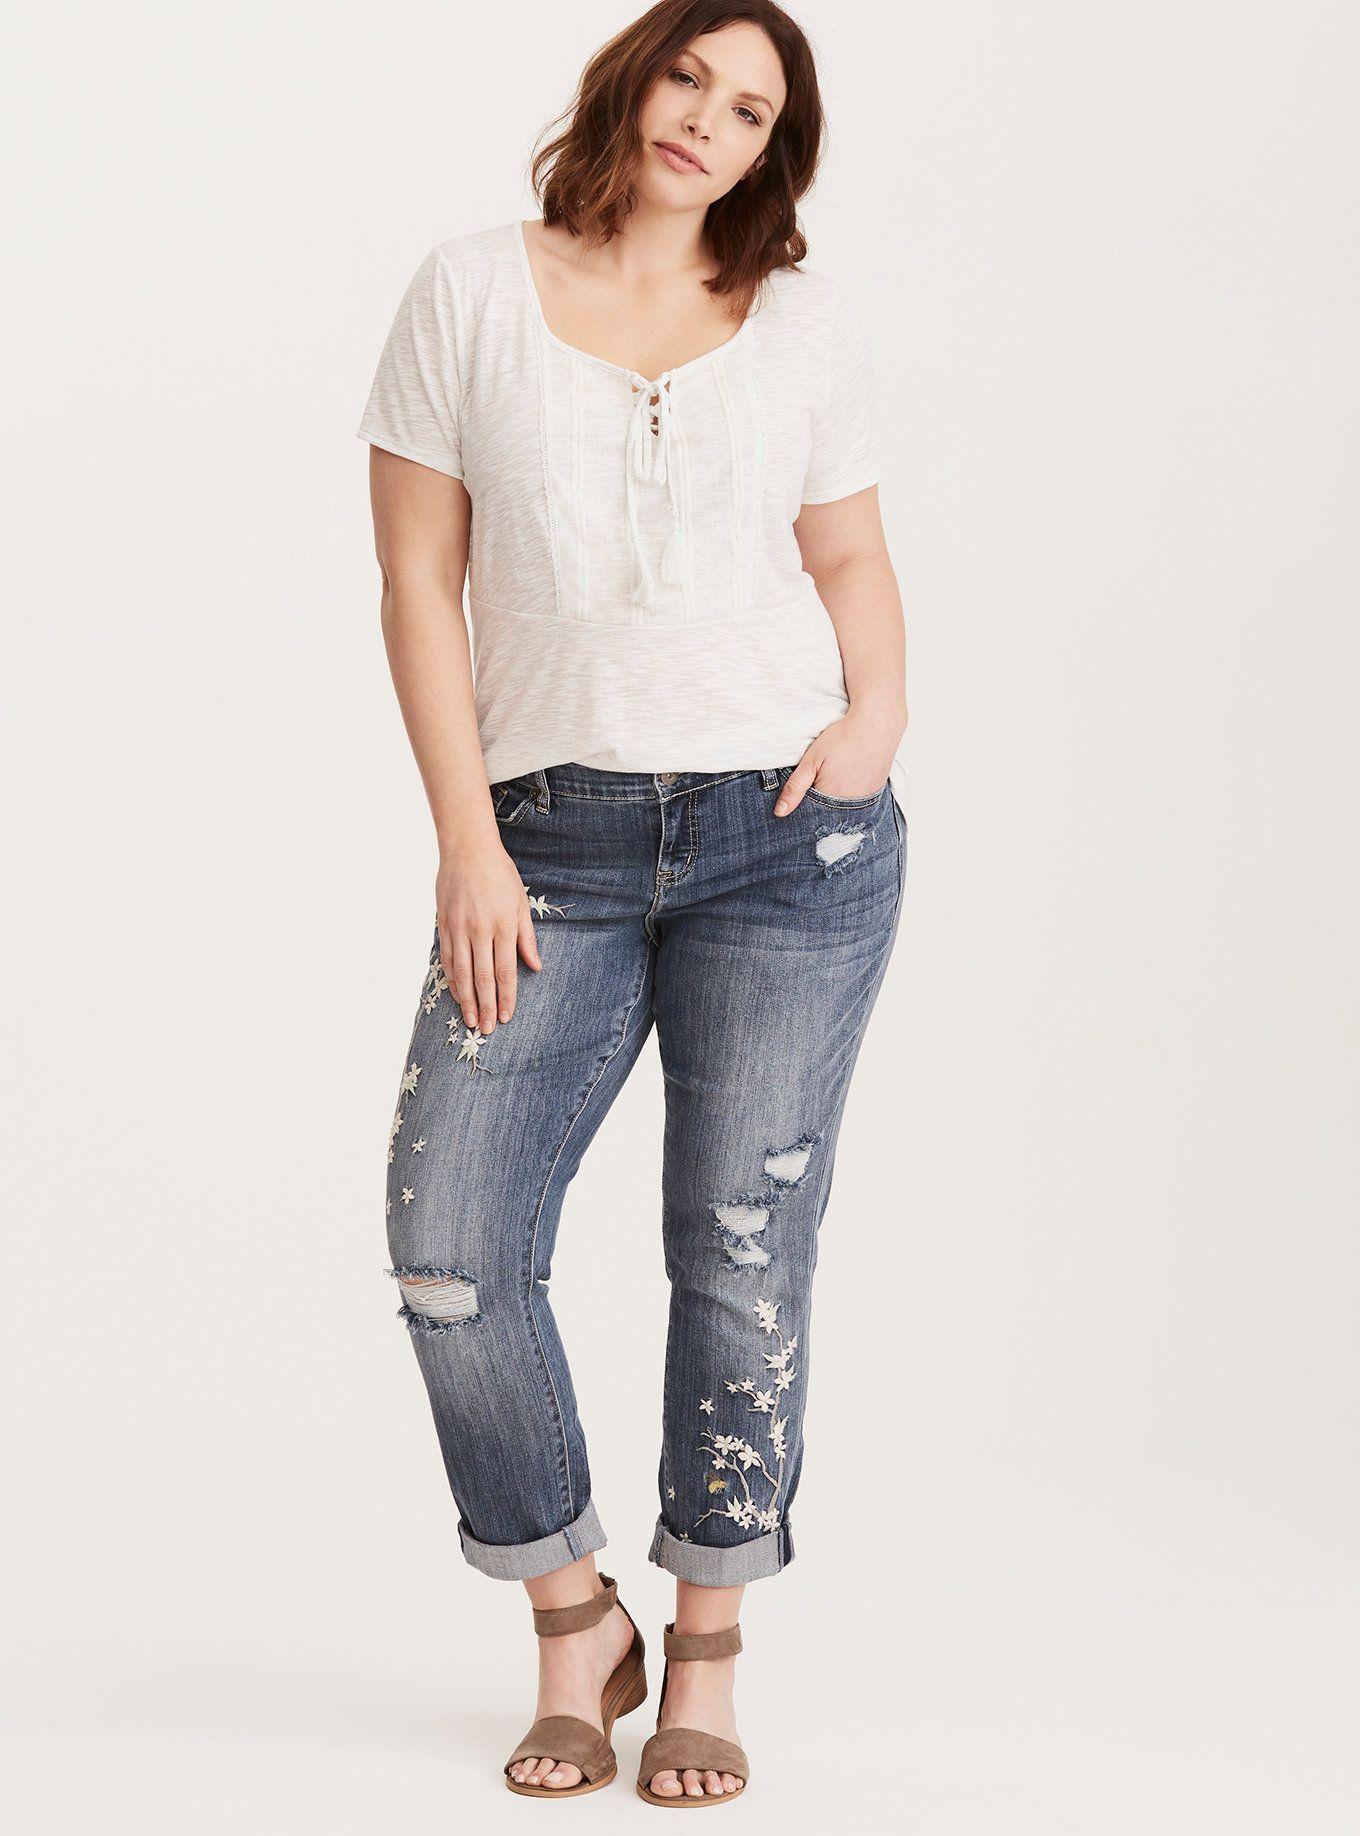 Premium Boyfriend Jeans Medium Wash with Floral Embroidery